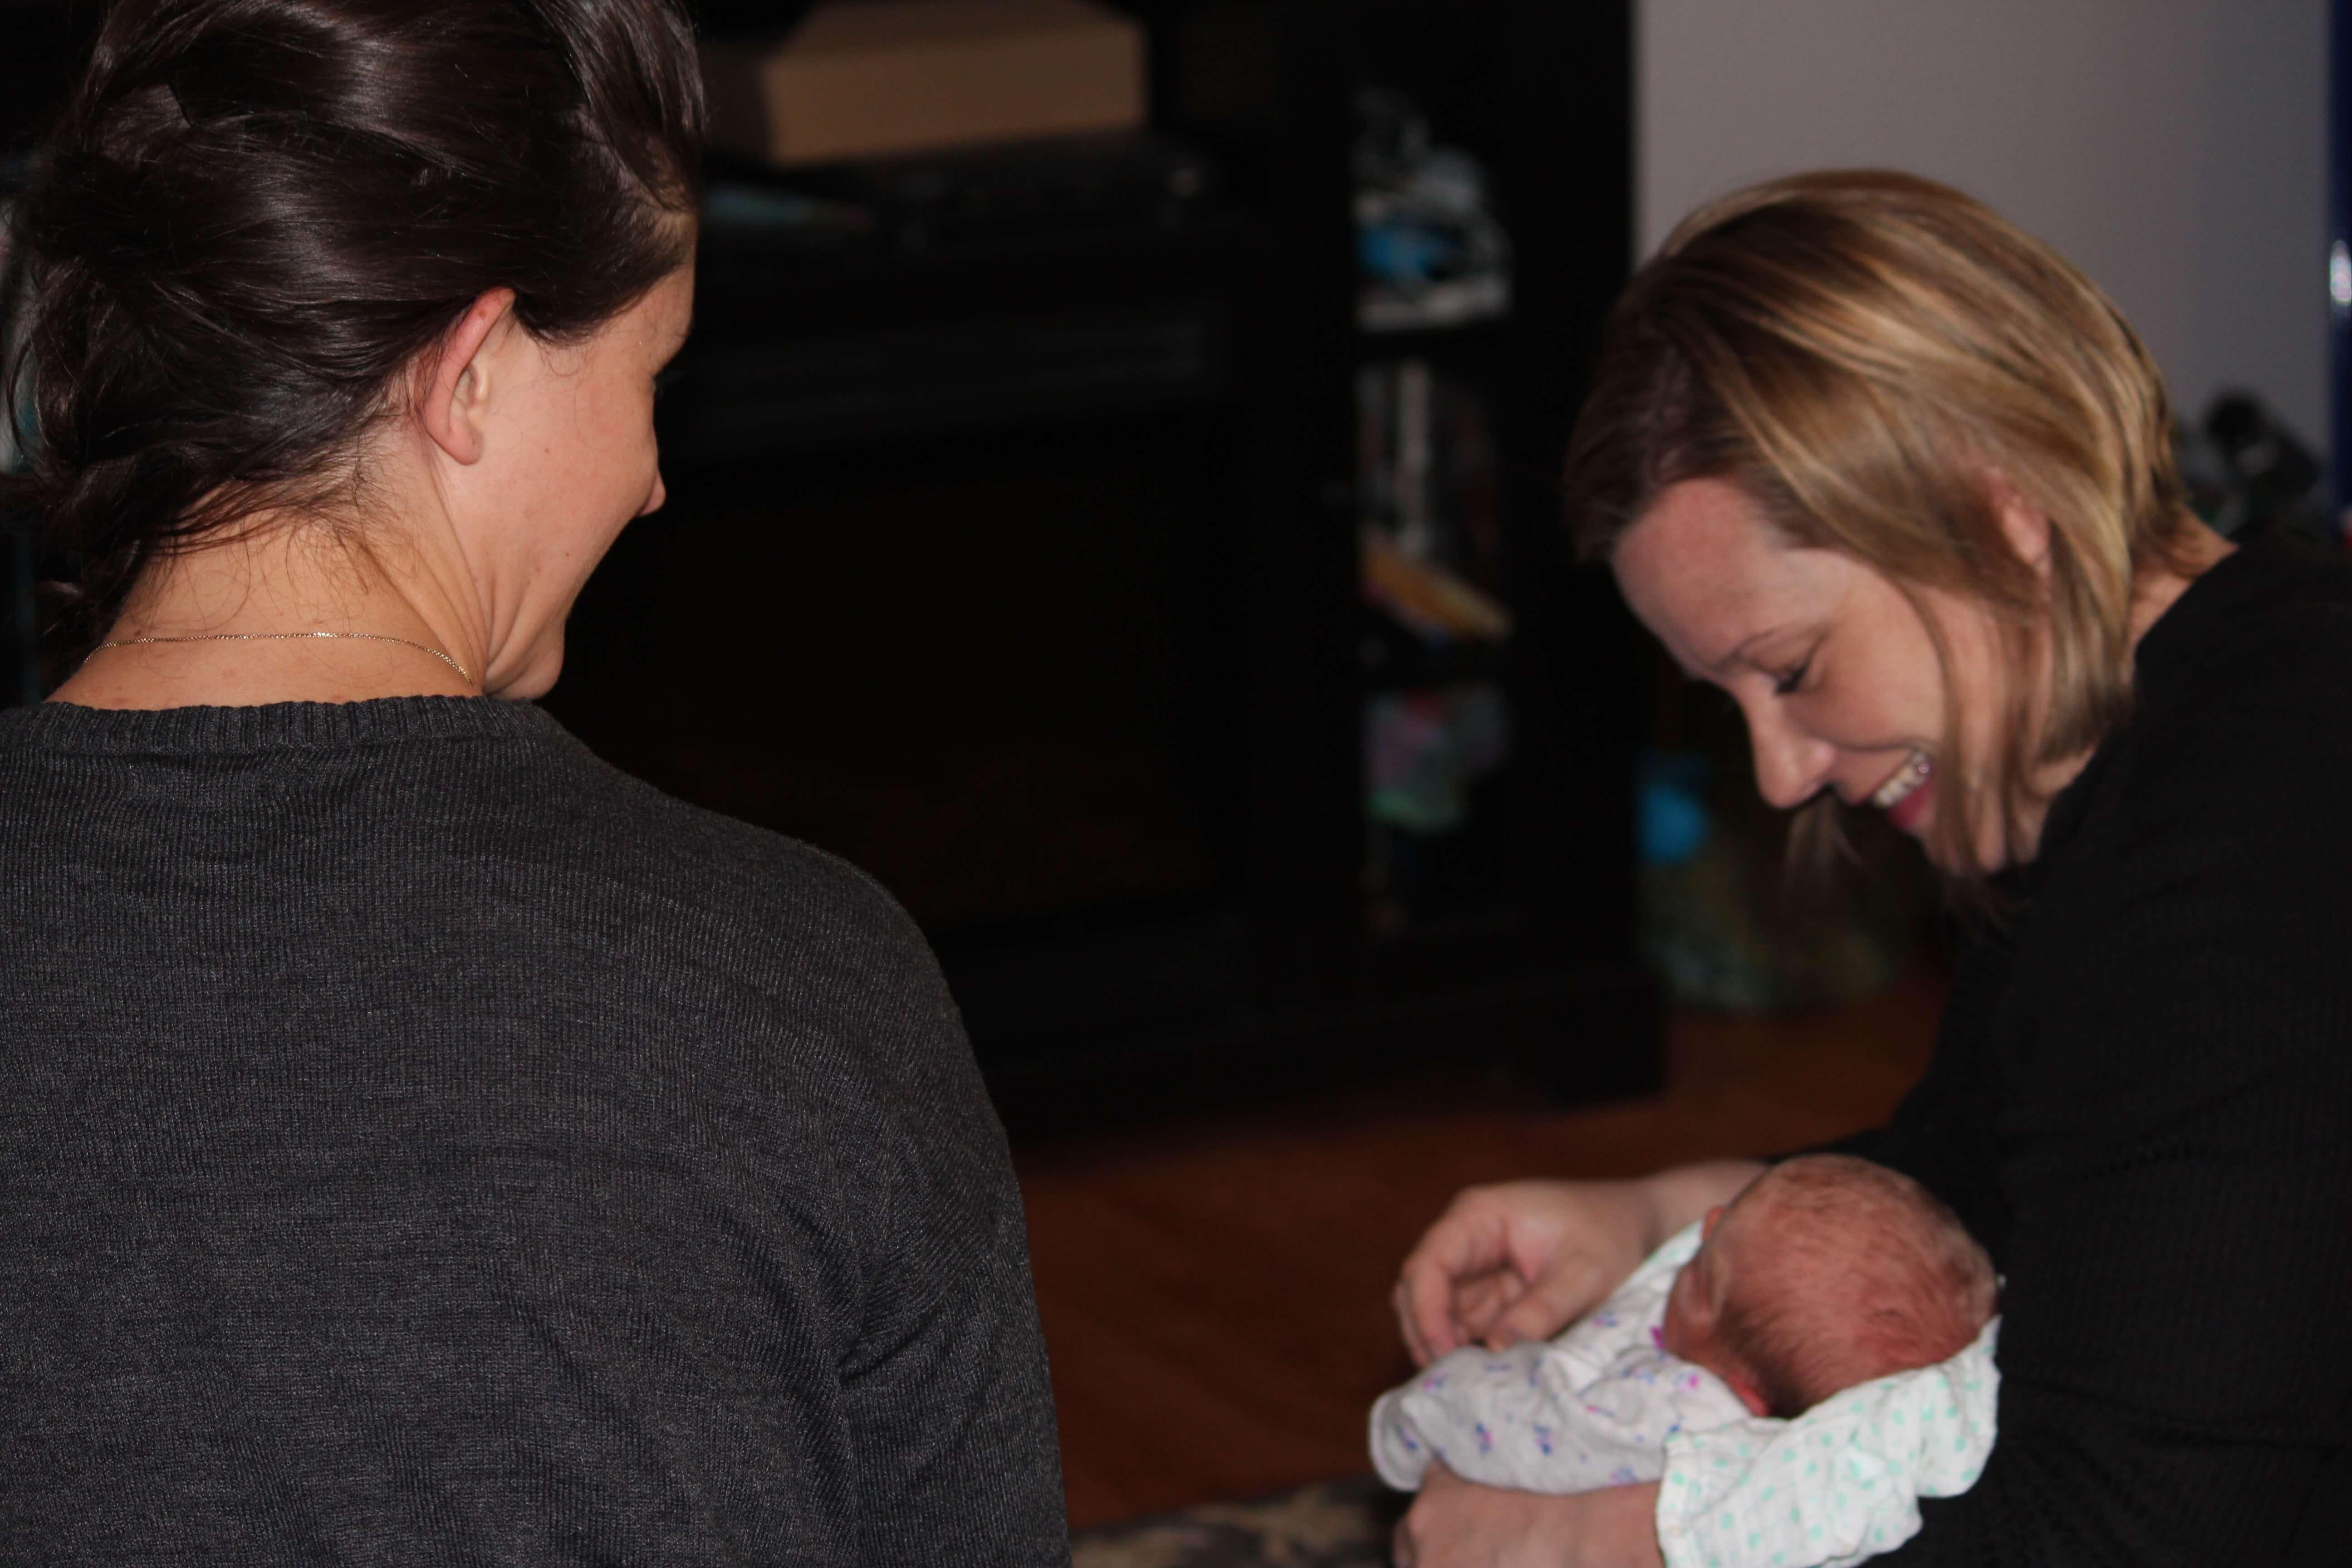 JoySpring Midwifery philosophy advocacy